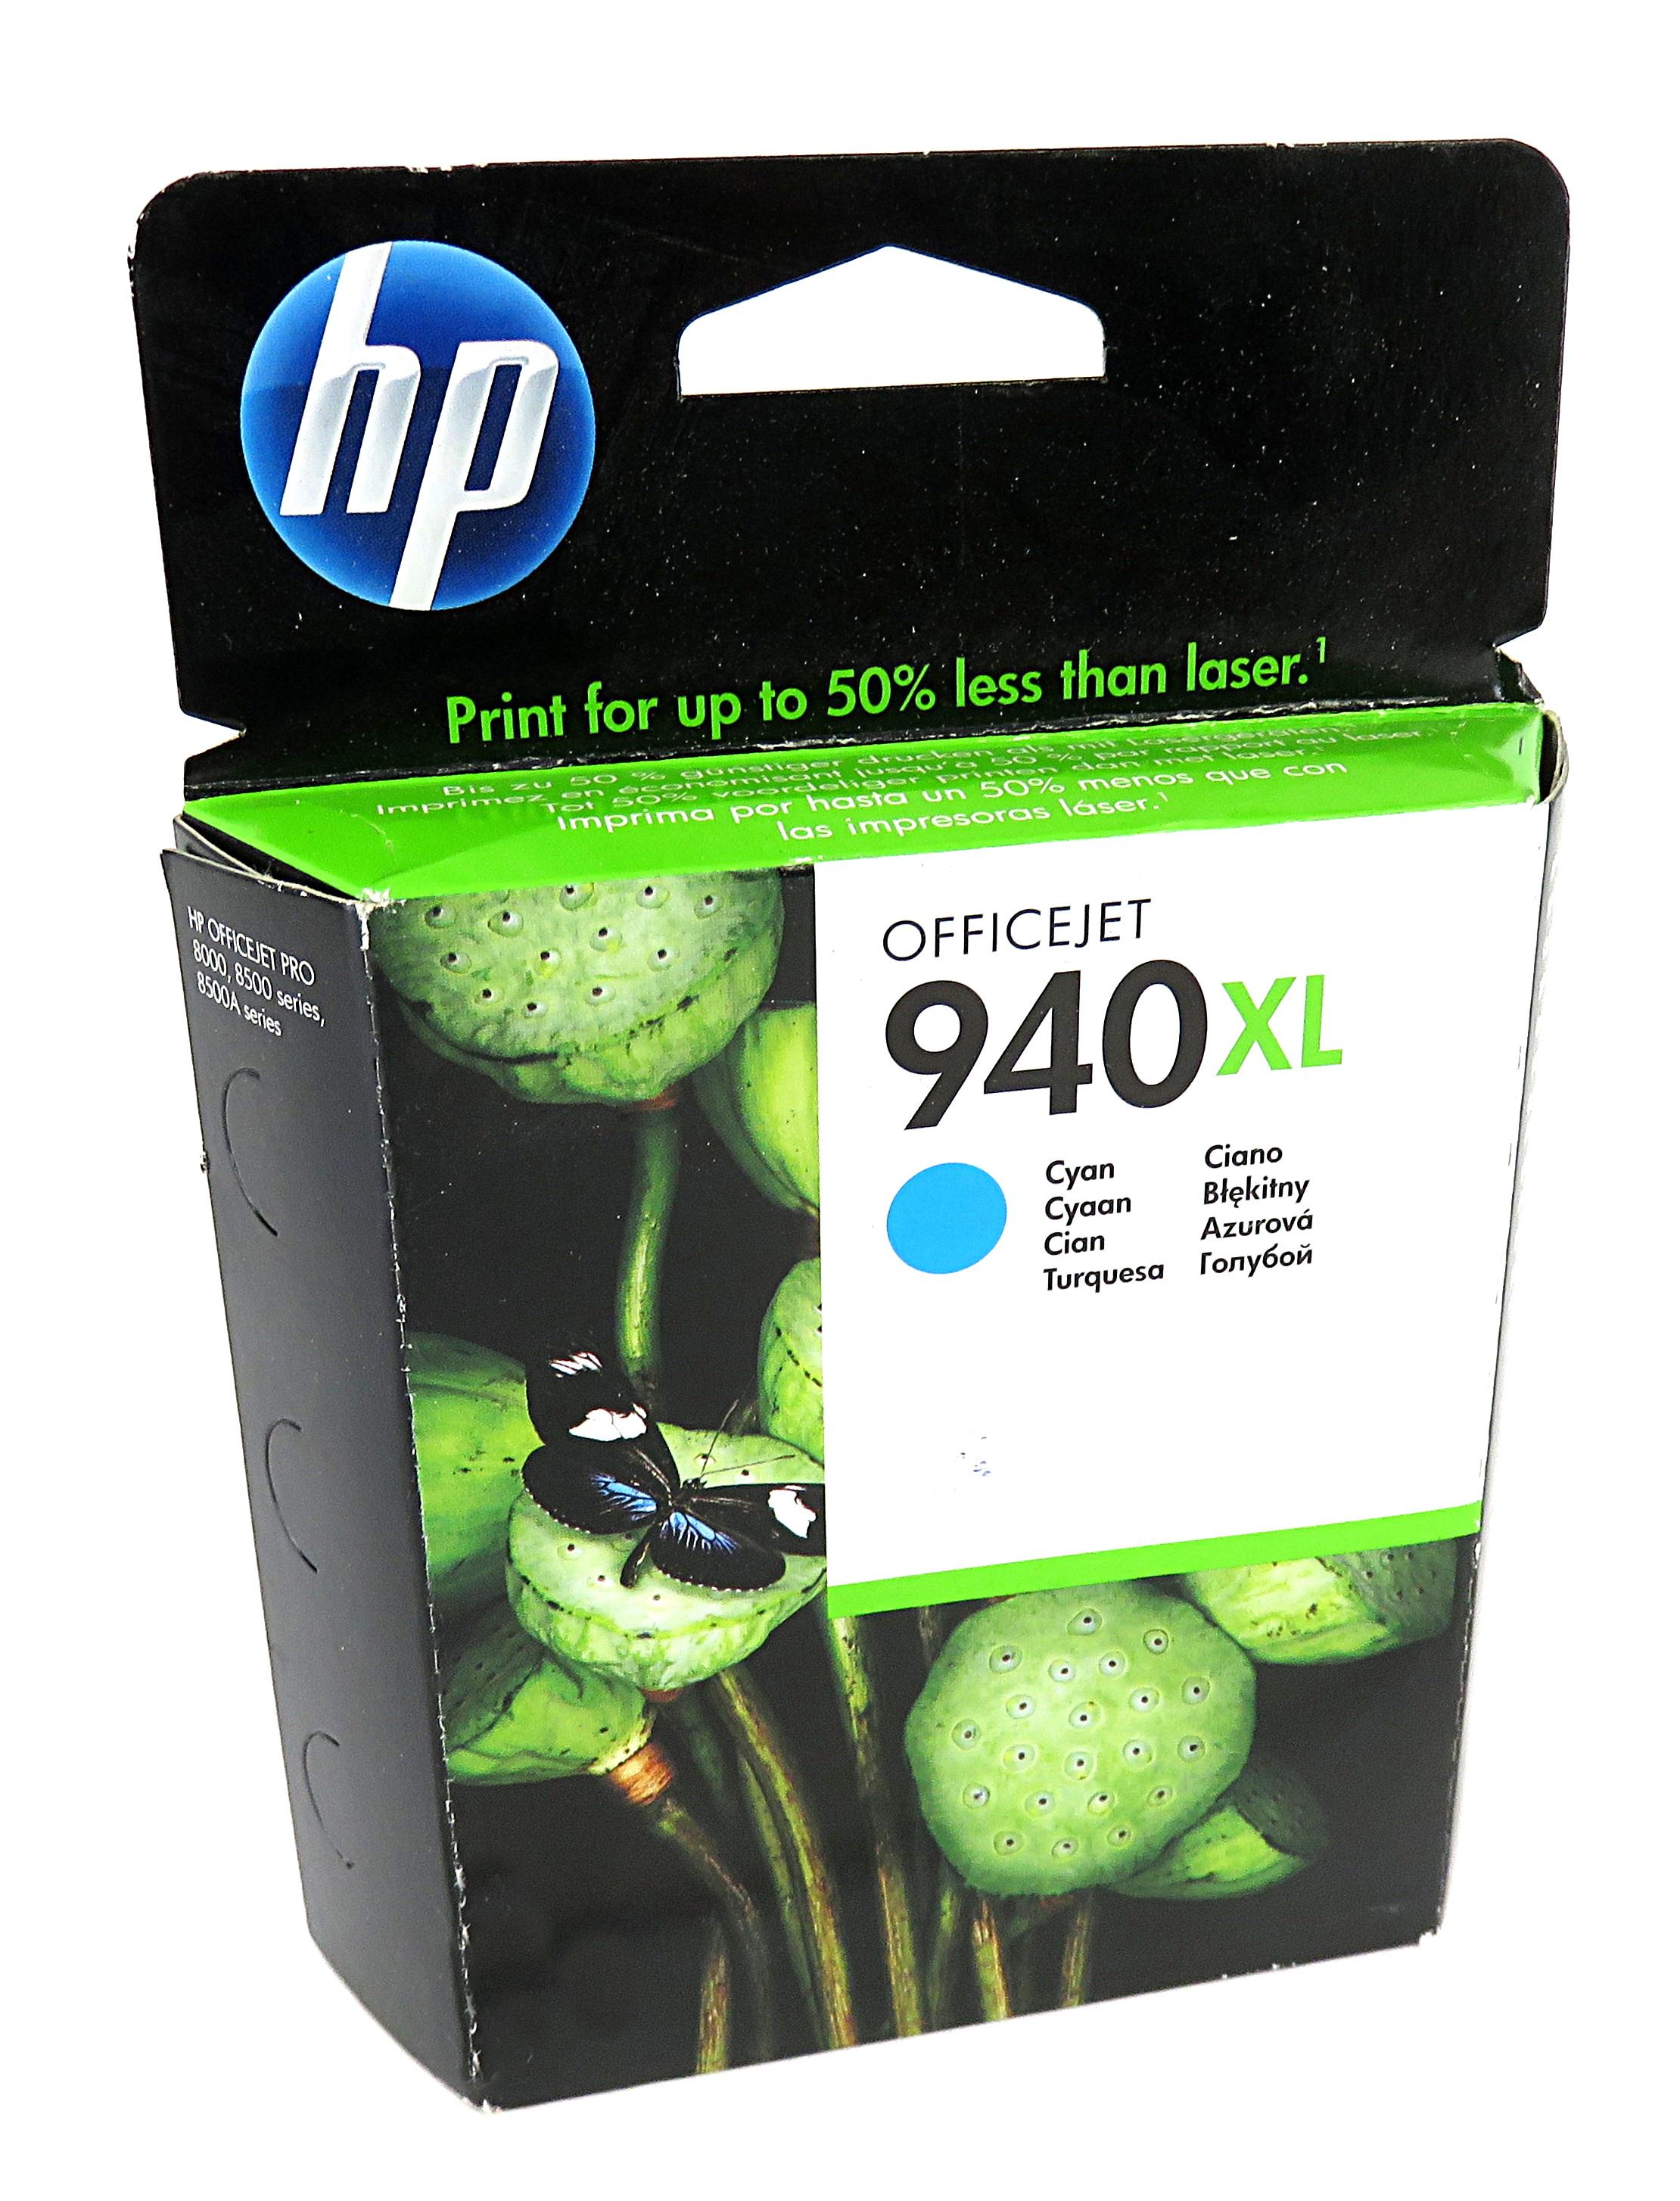 New Genuine HP C4907AE/940XL High-Capacity Cyan Ink Cartridge - Expired Stock